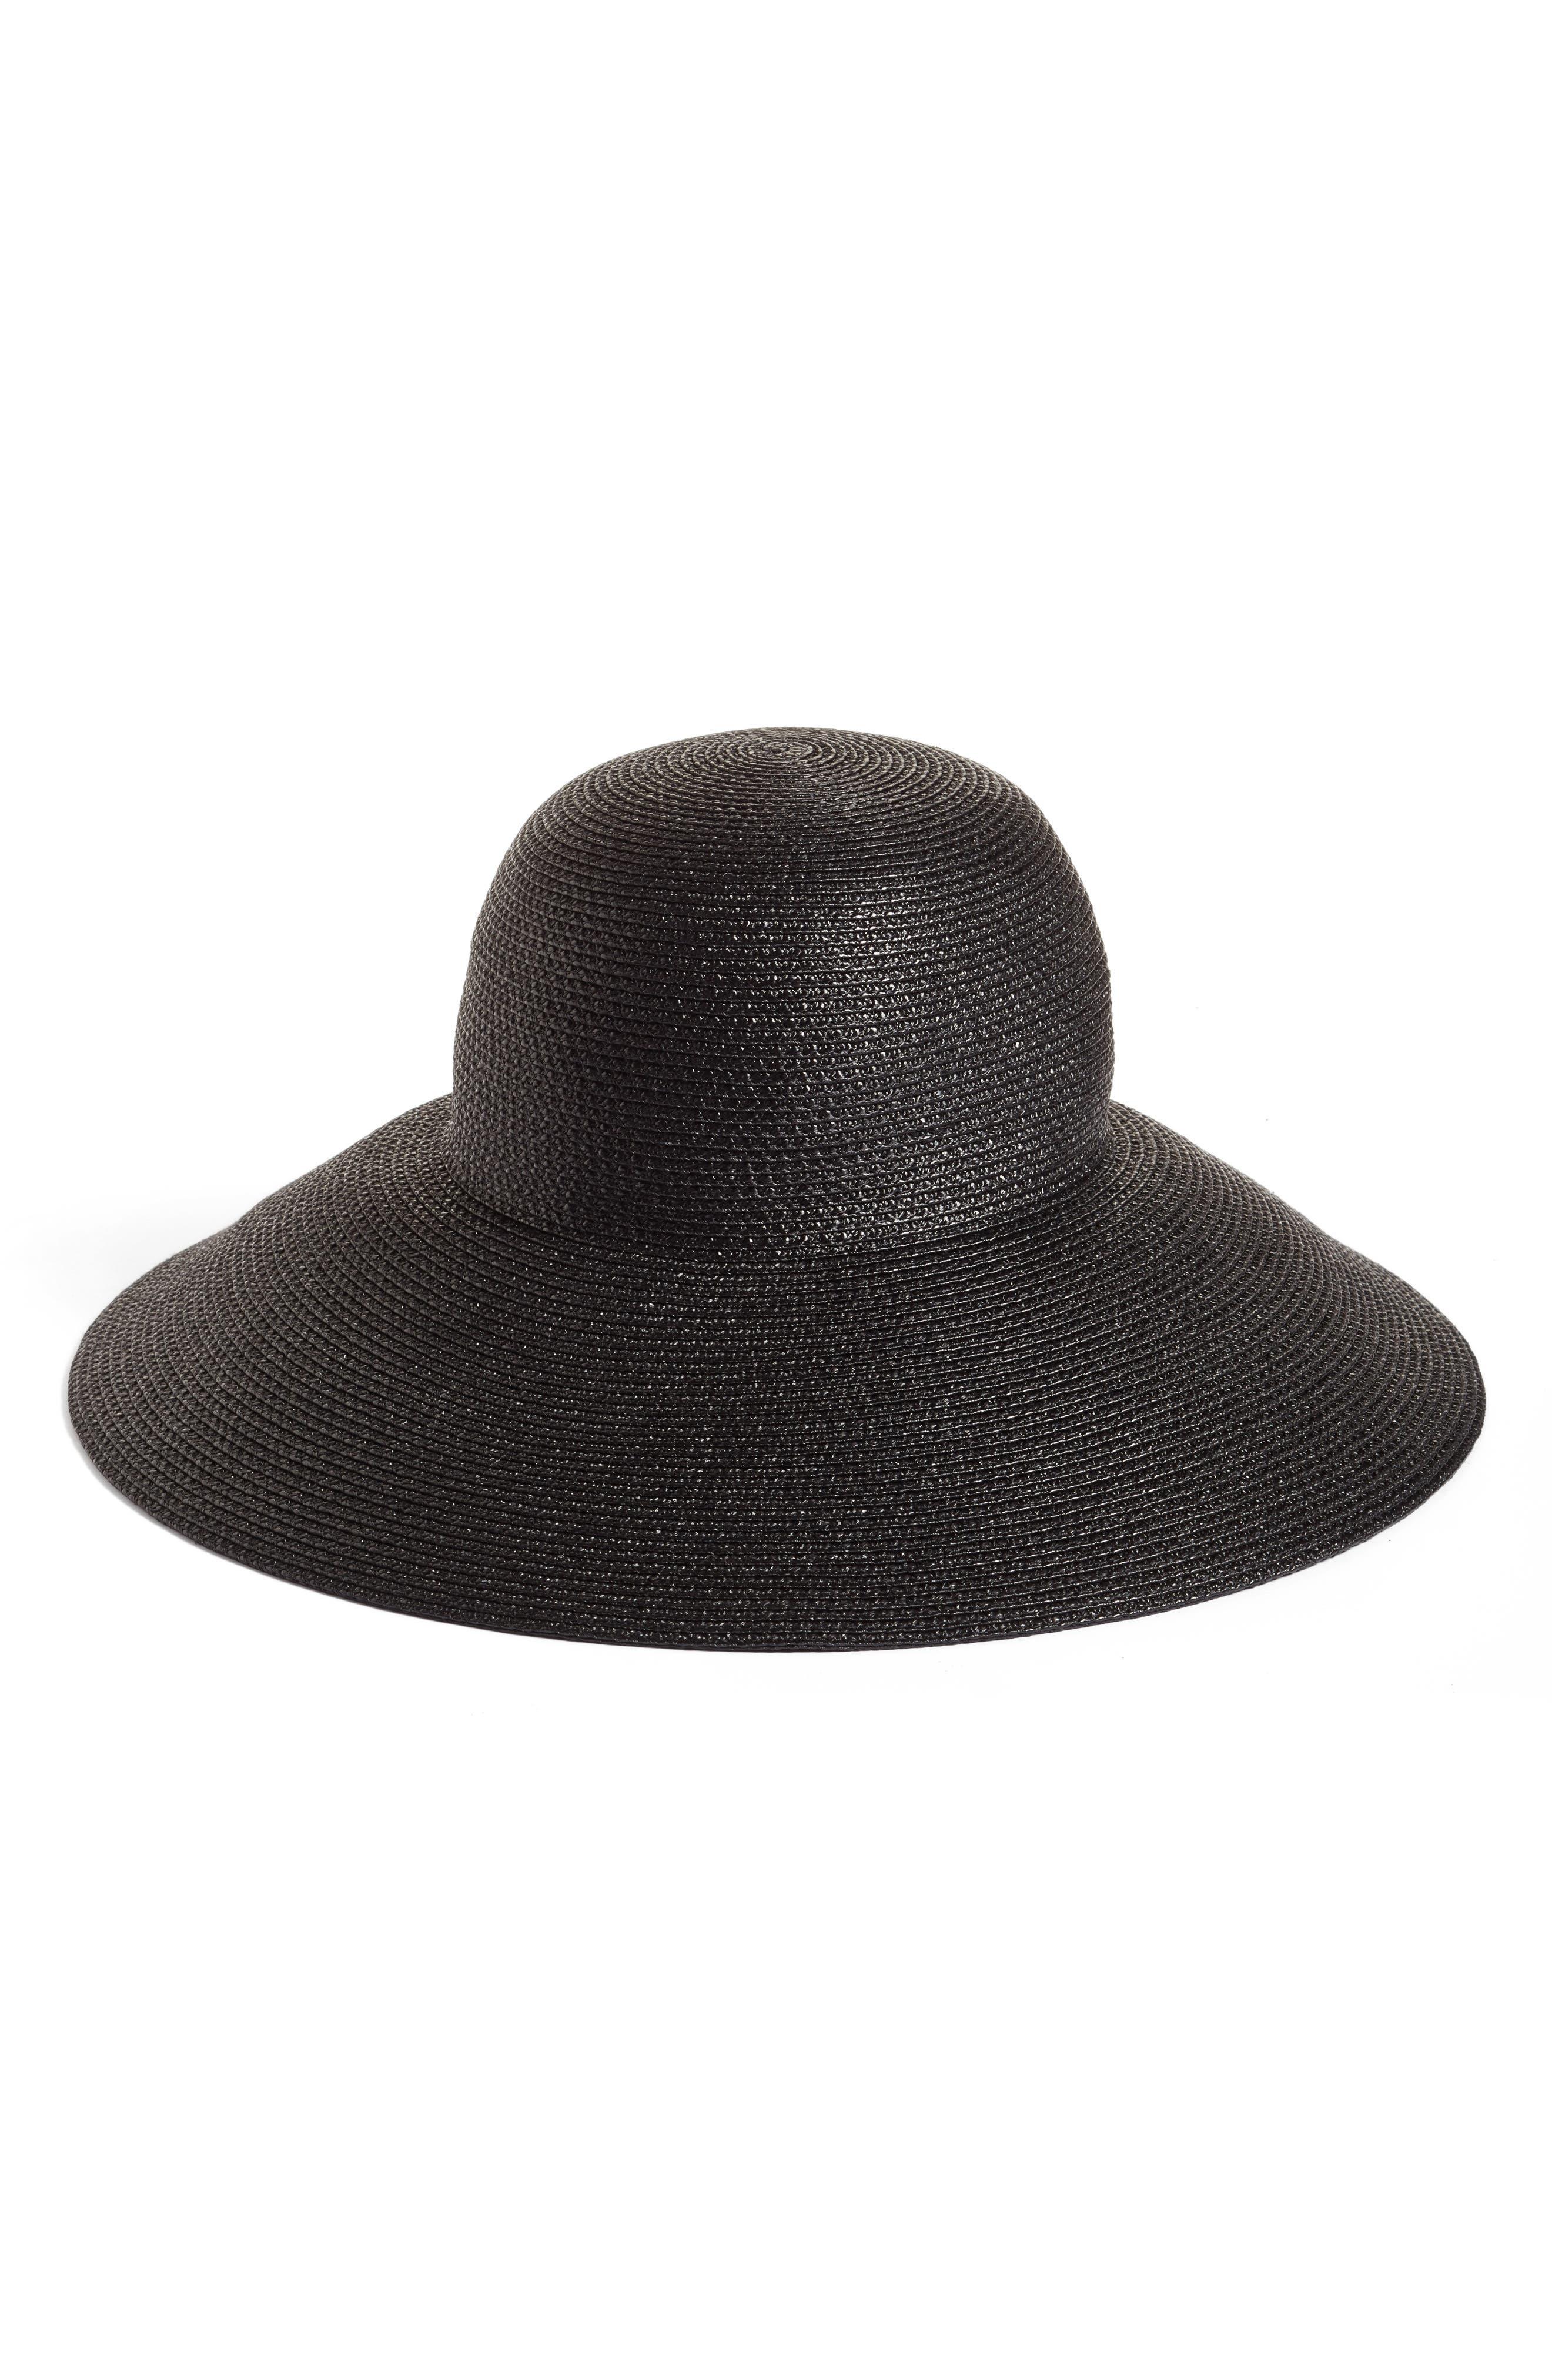 Bella Squishee<sup>®</sup> Sun Hat,                         Main,                         color, Black